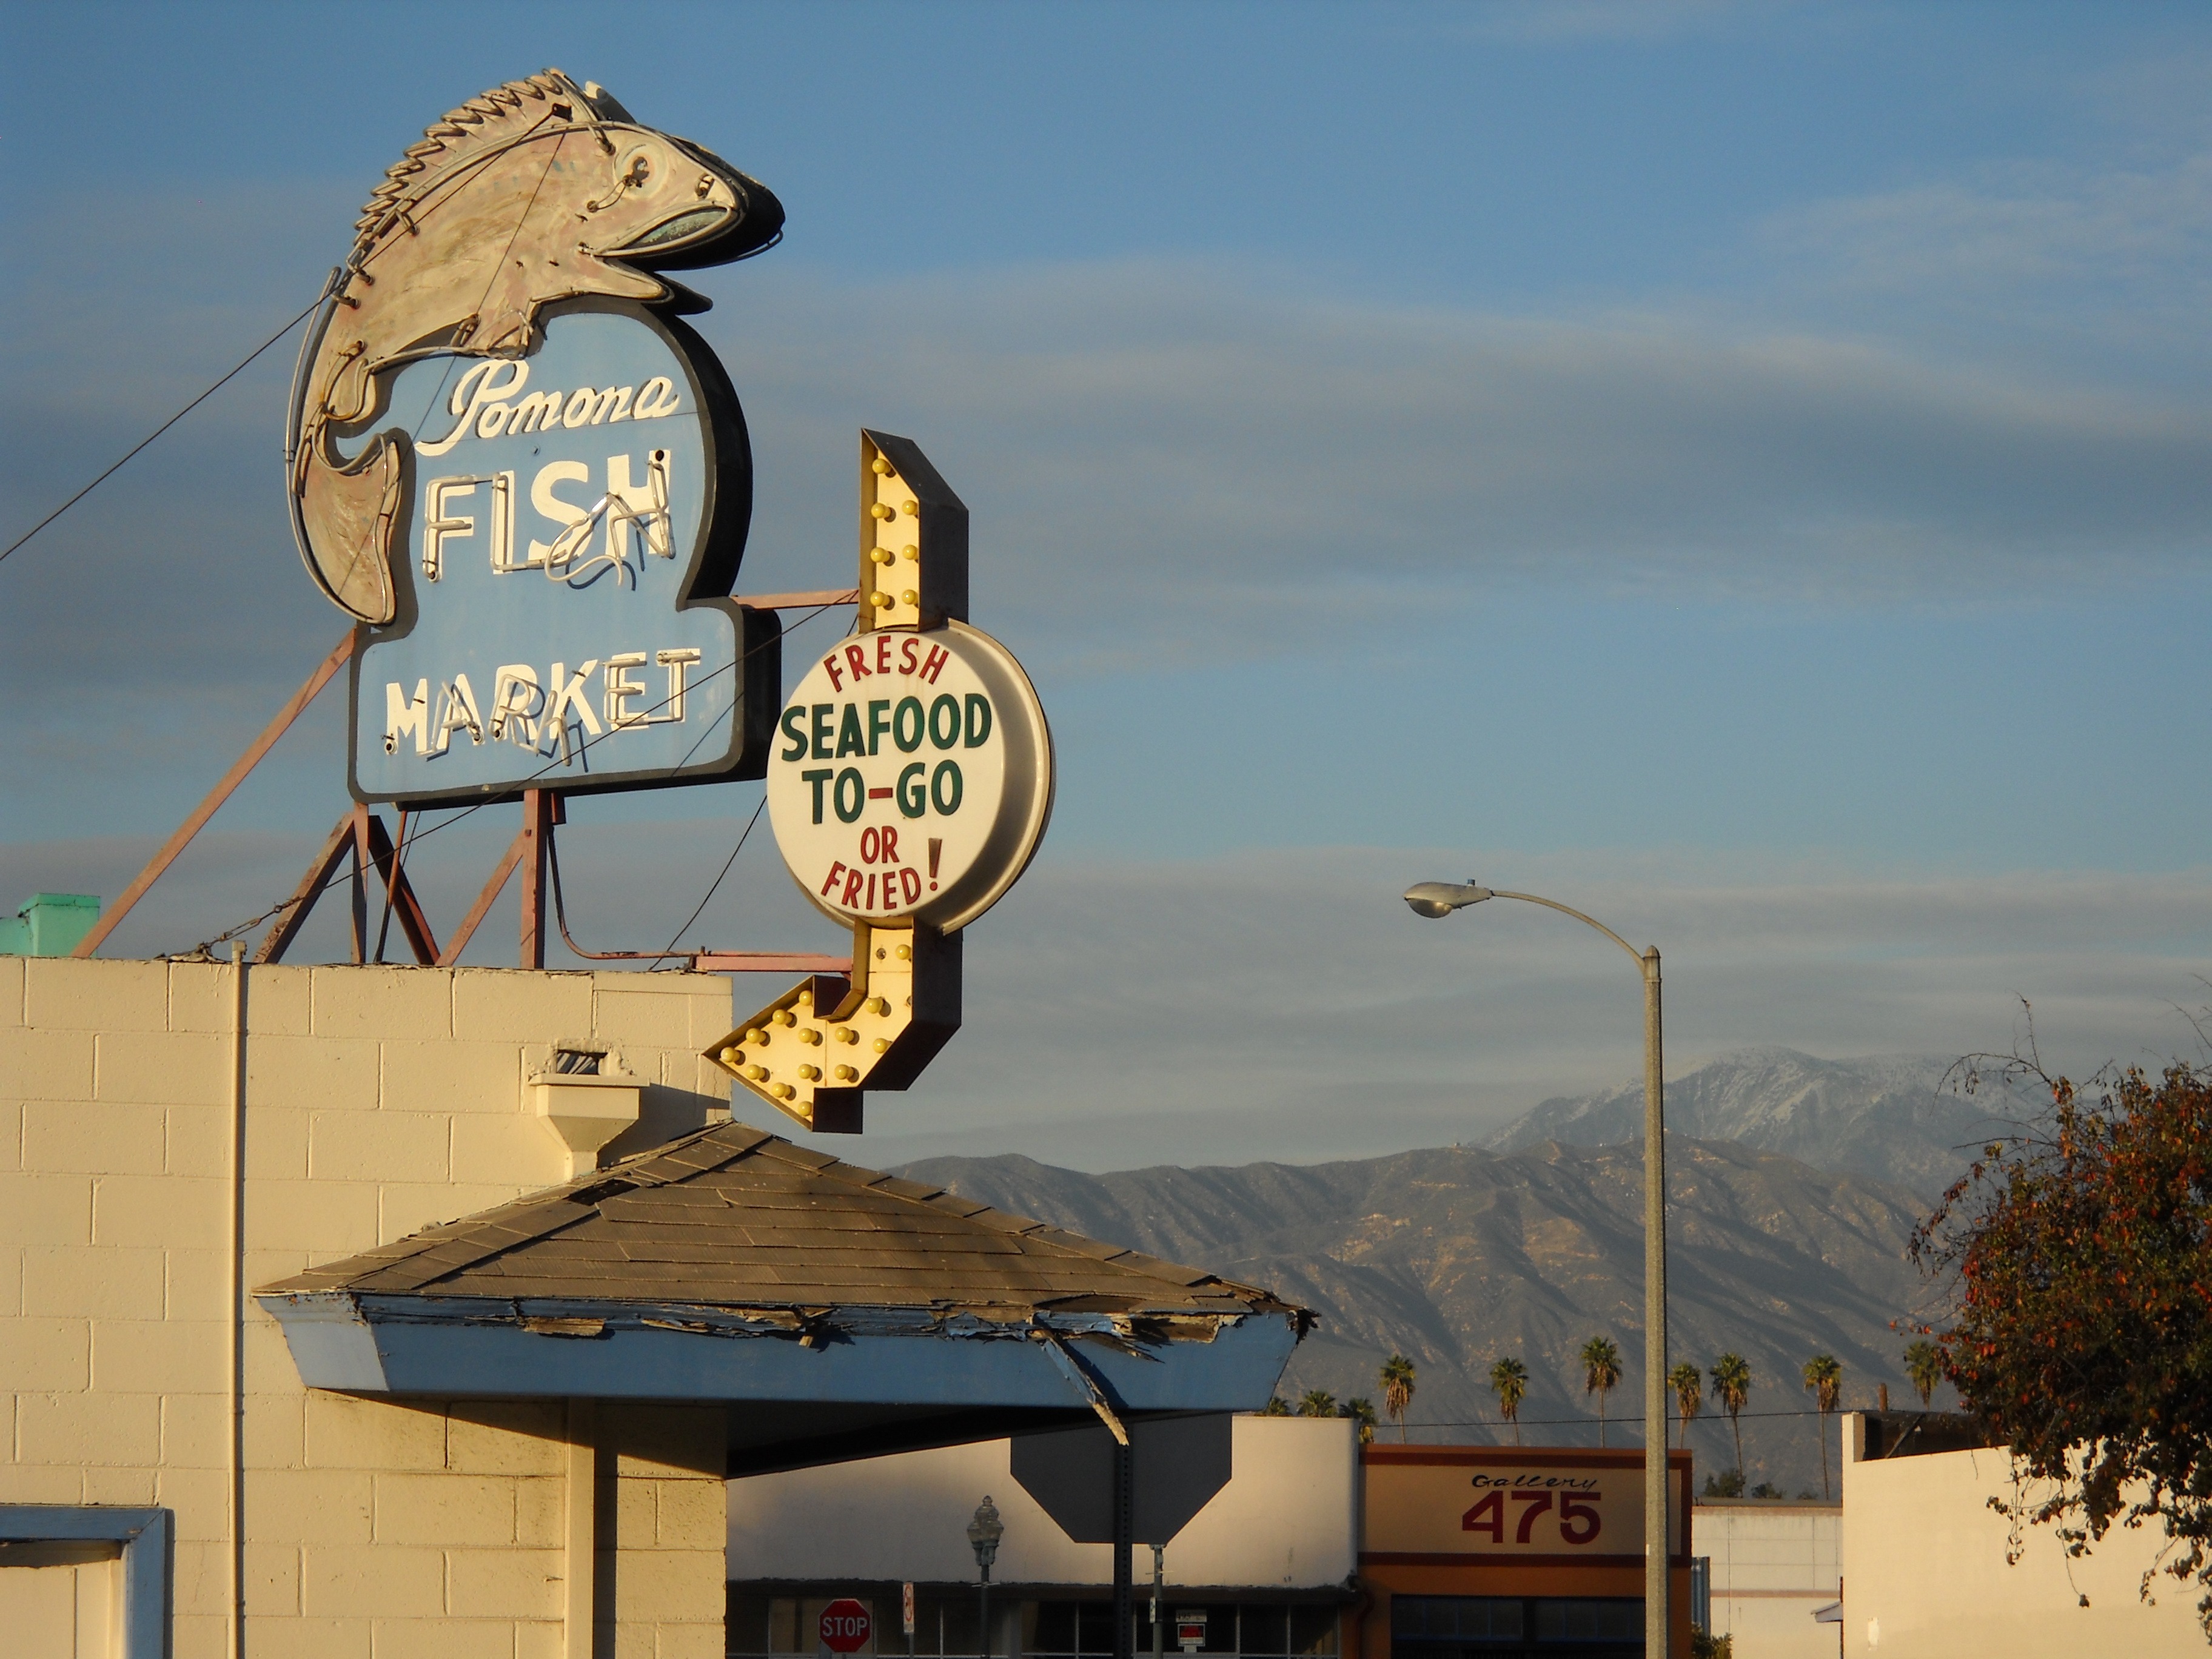 Pomona Fish Market